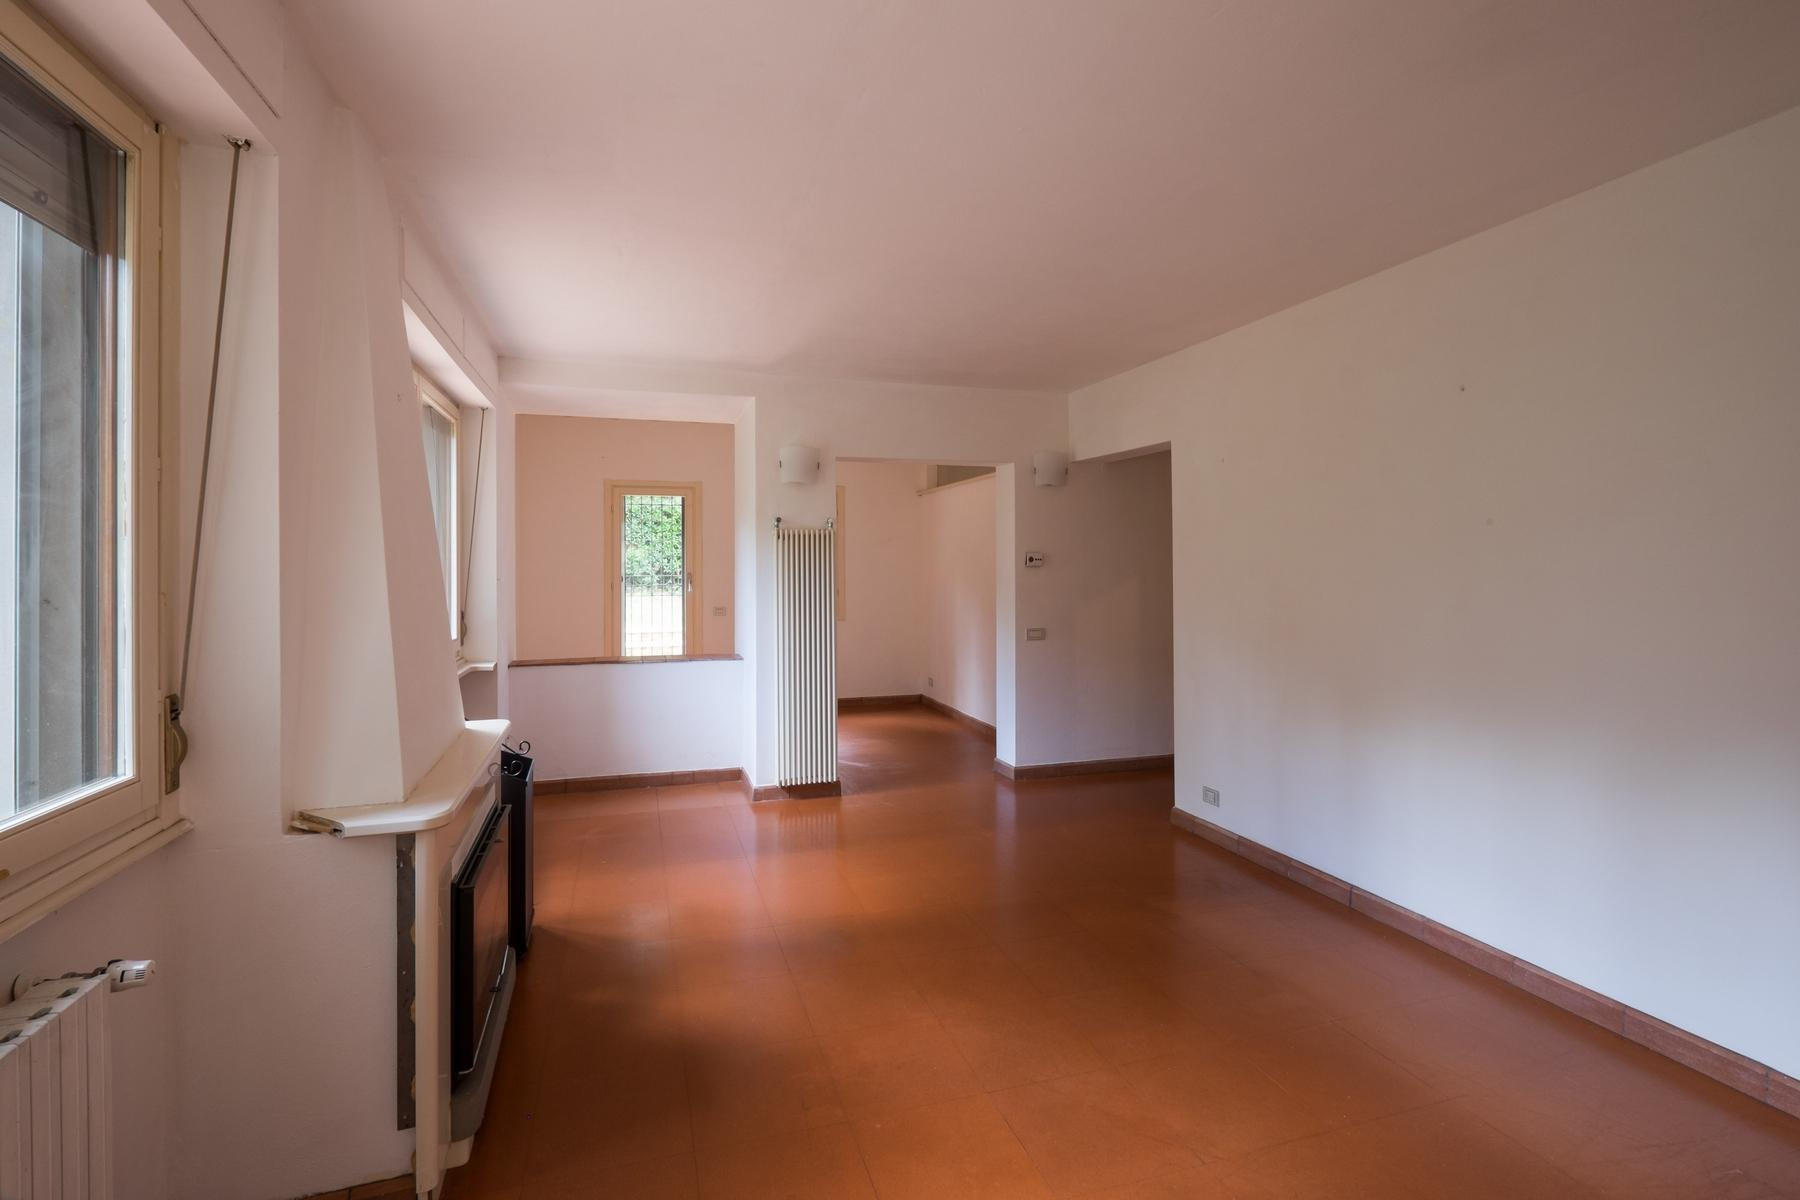 Schöne Wohnung in Poggio Imperiale - 3